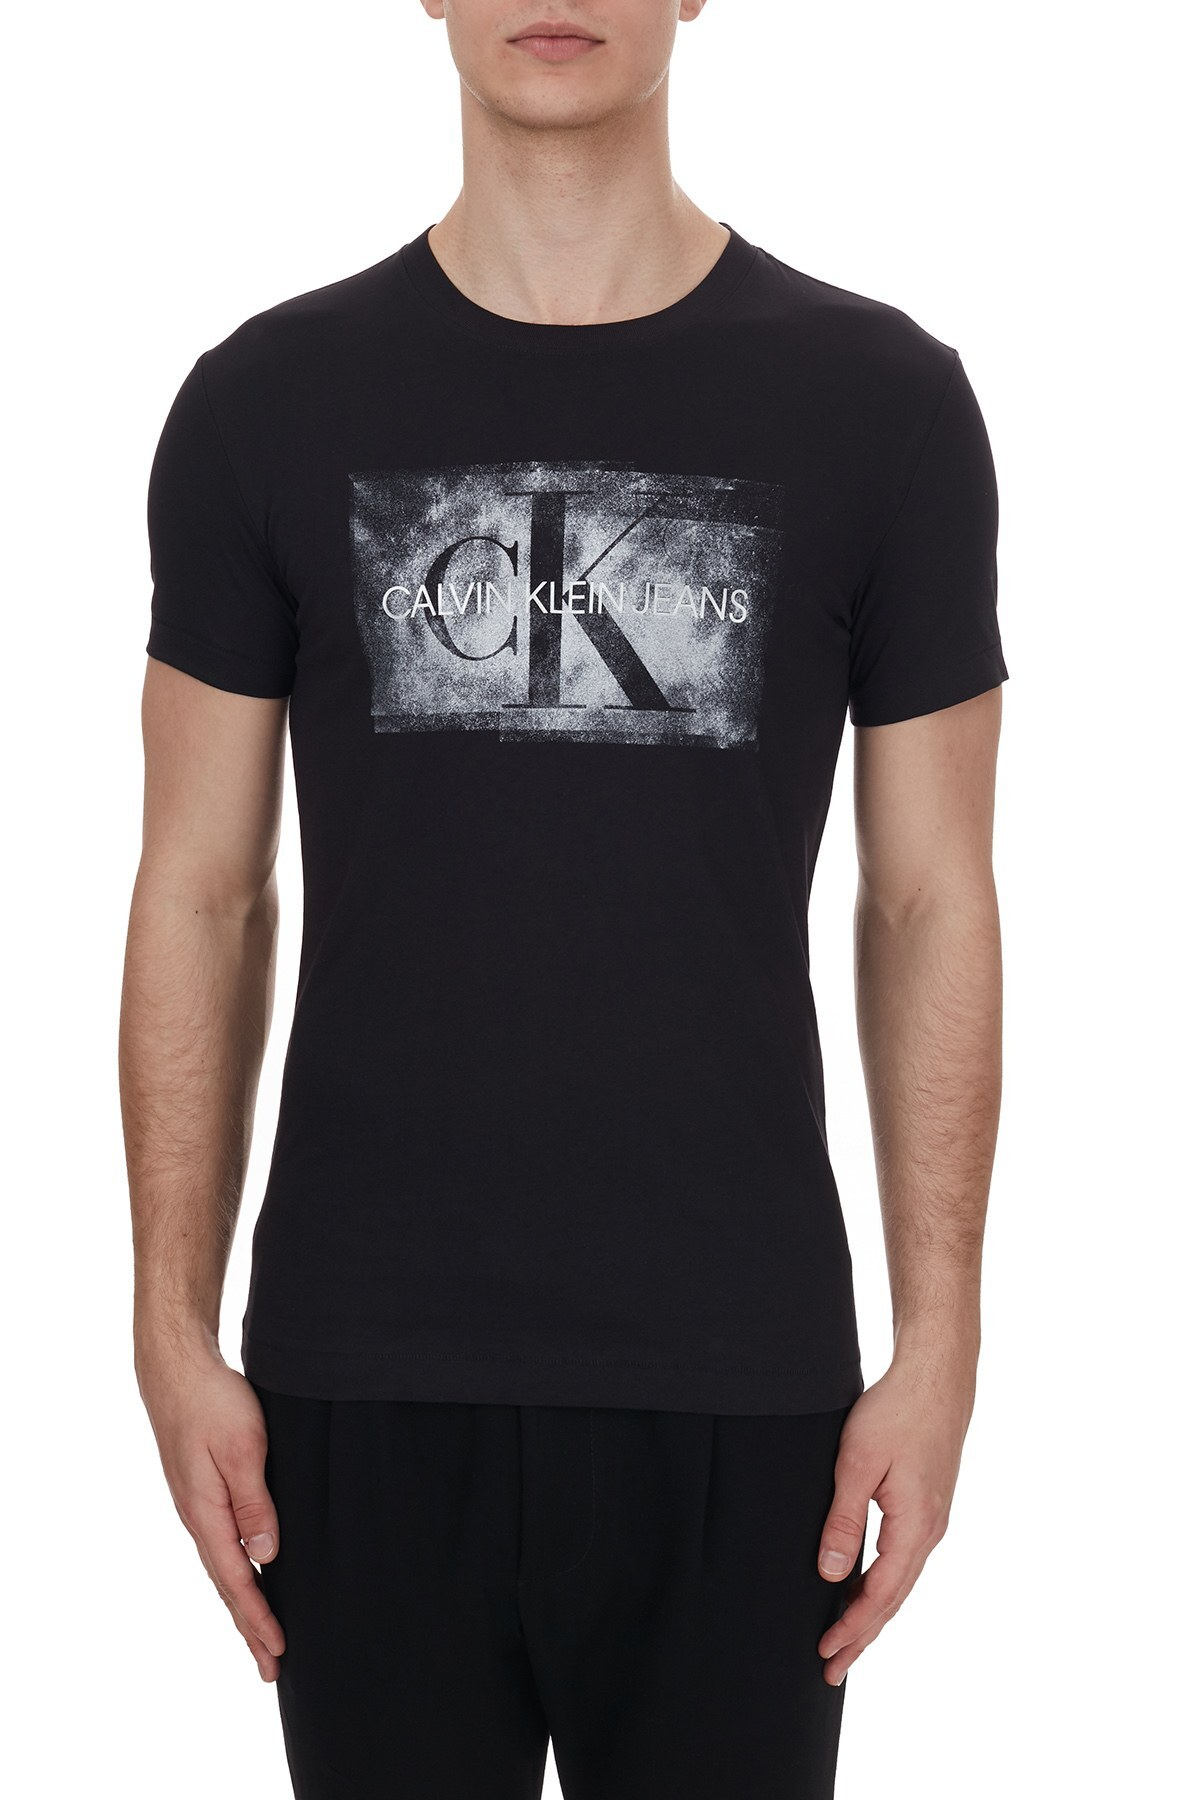 Calvin Klein Logo Baskılı Bisiklet Yaka % 100 Pamuk Erkek T Shirt J30J316733 BEH SİYAH